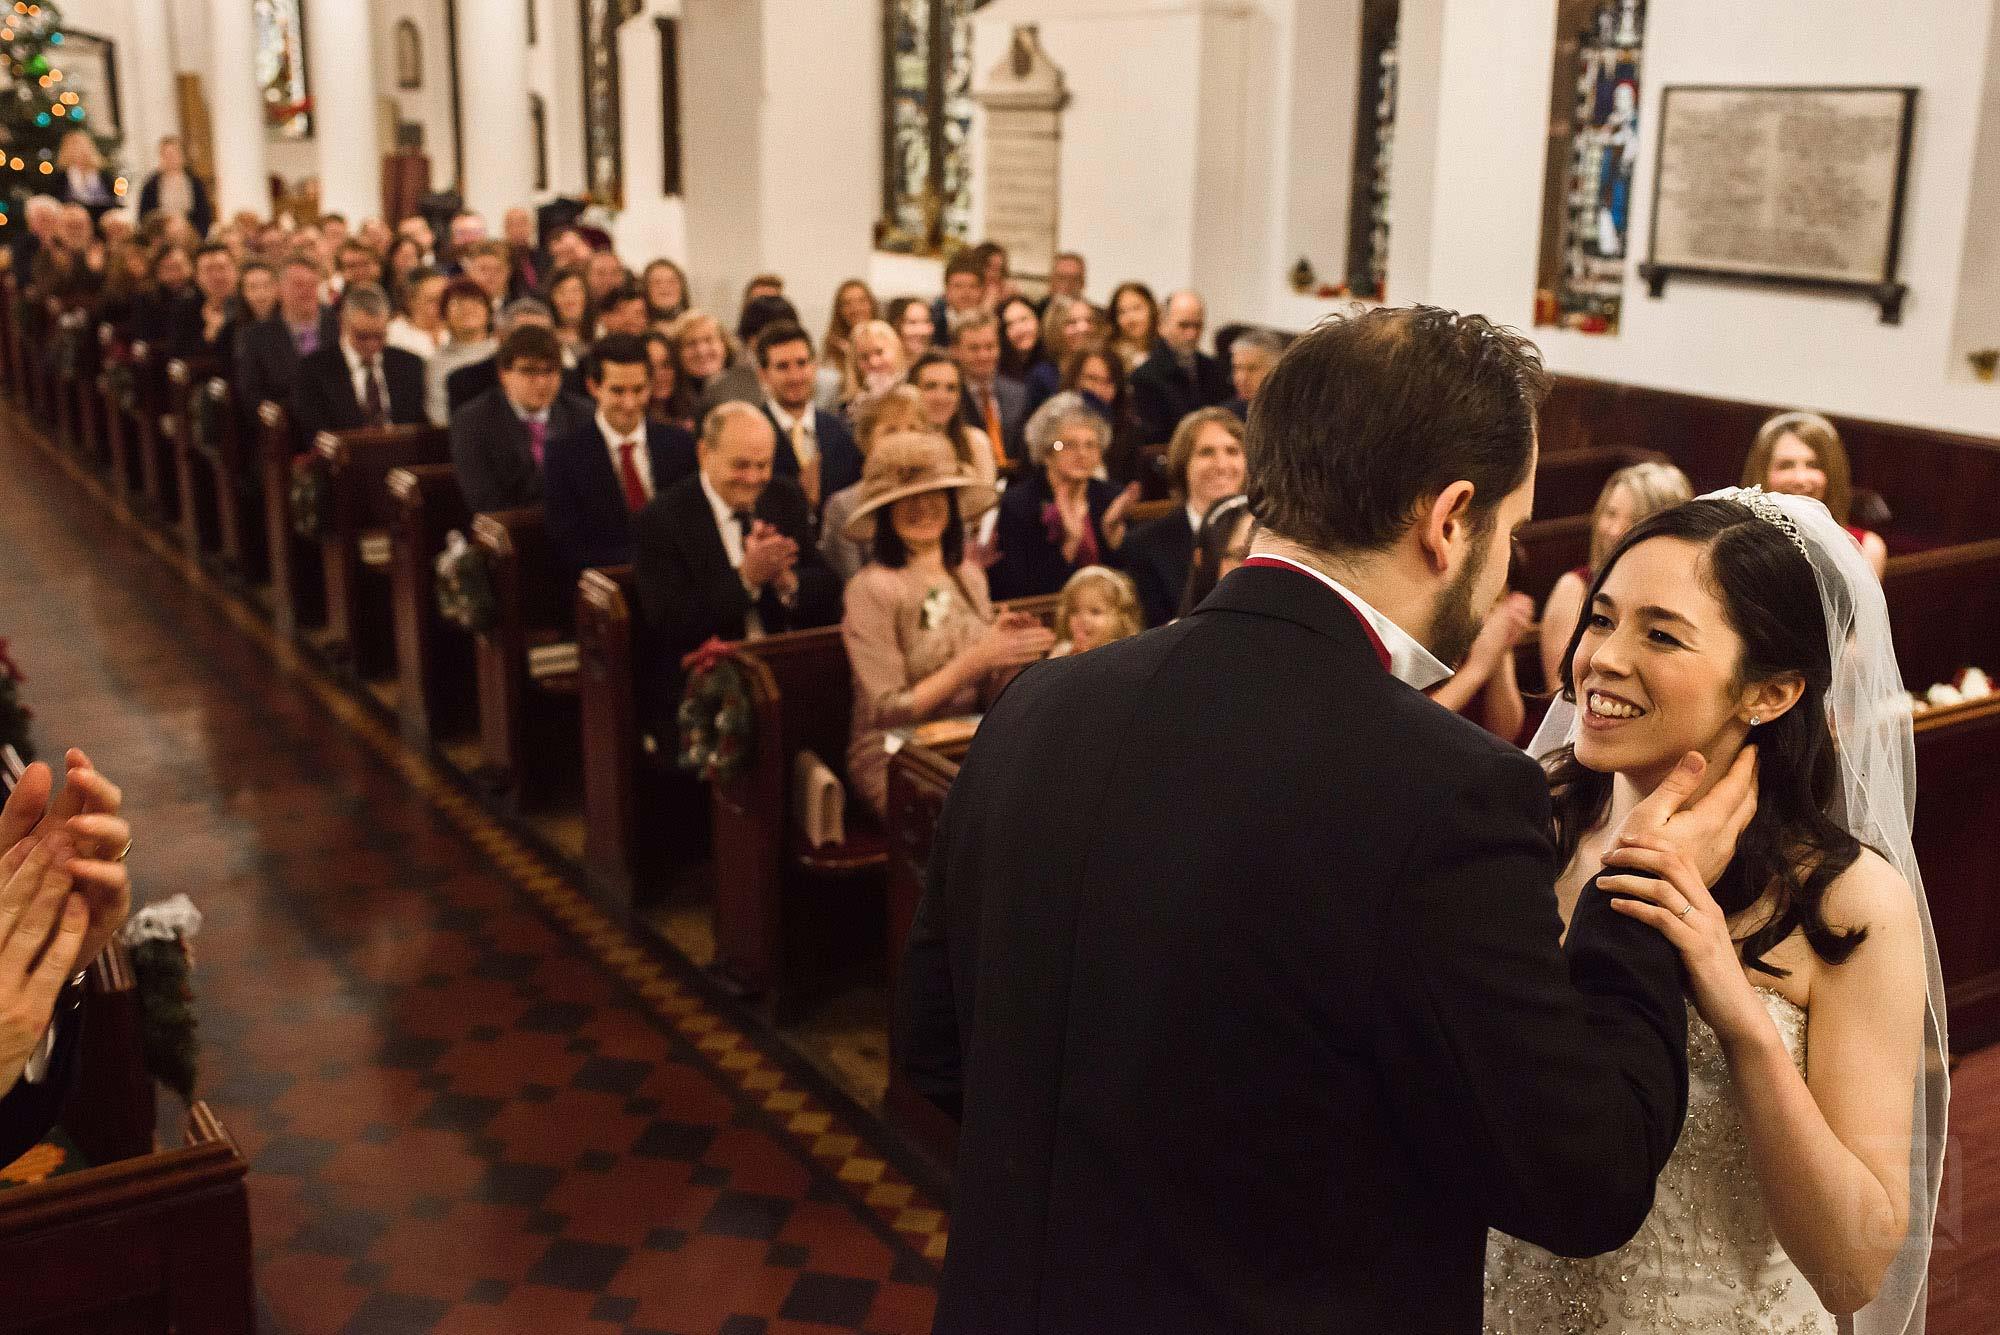 emotional moment during wedding ceremony